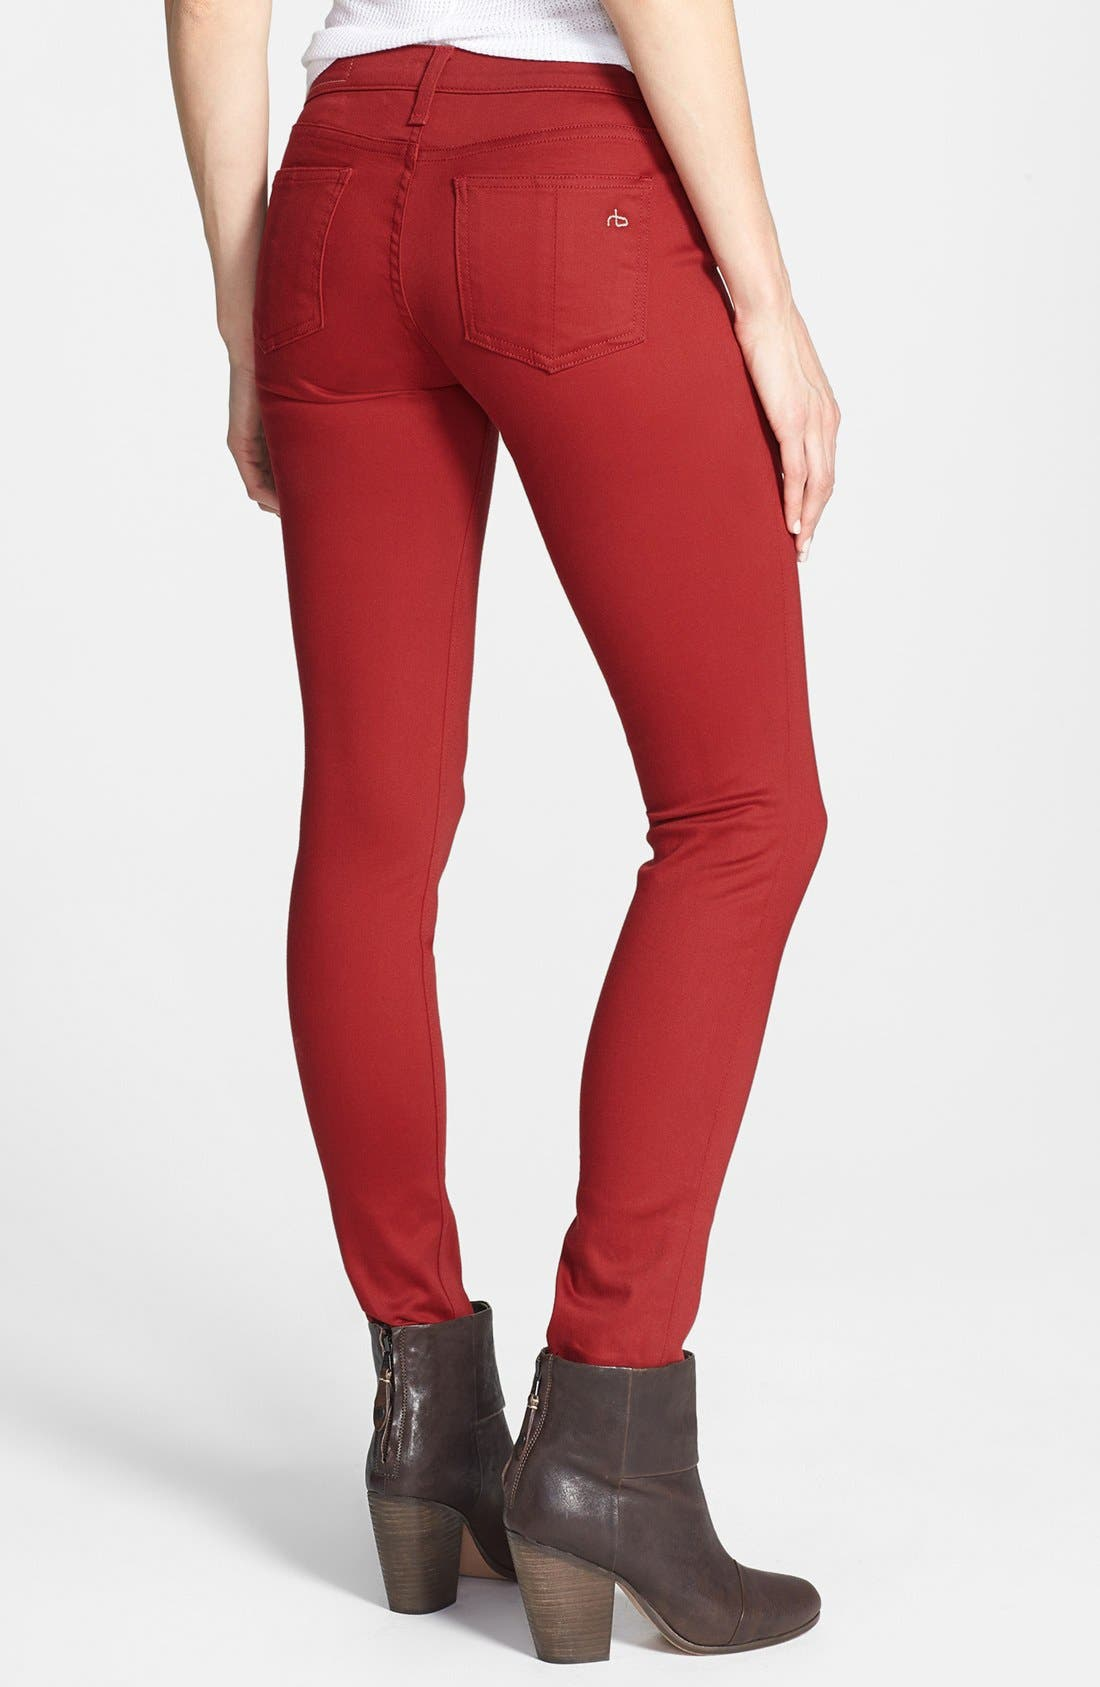 Alternate Image 2  - rag & bone/JEAN 'The Legging' Sateen Skinny Jeans (Red Sateen)